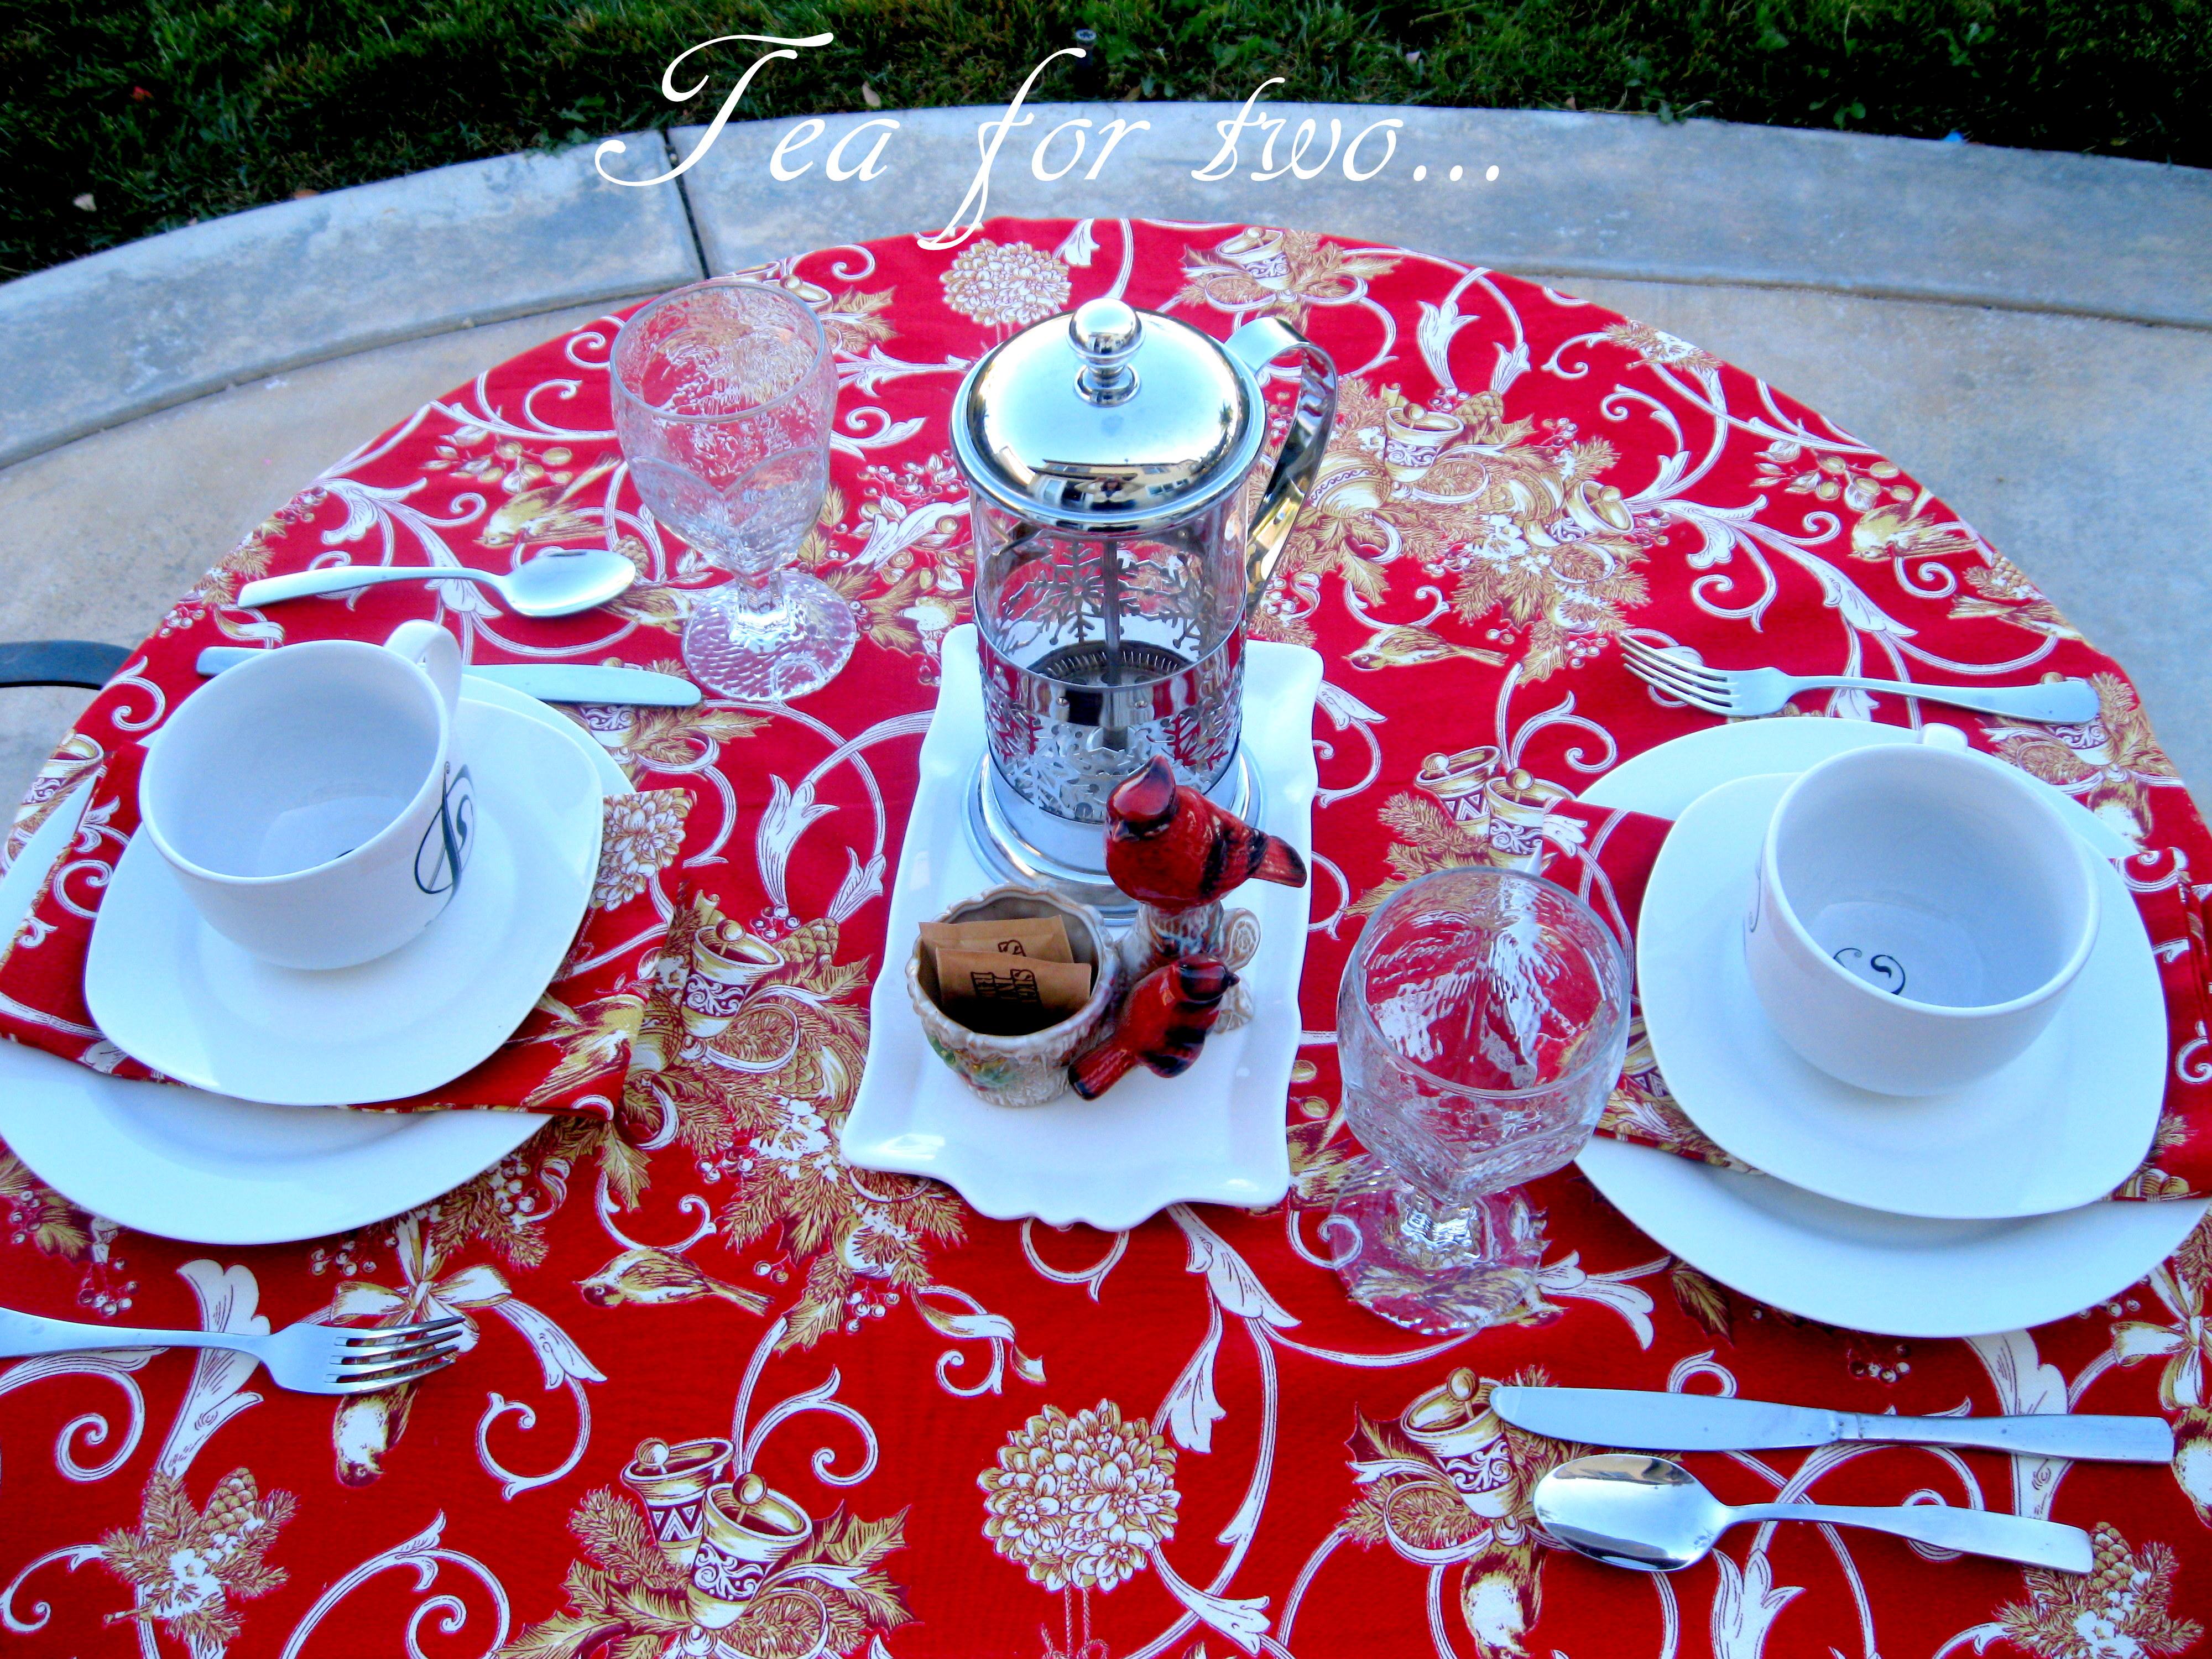 Table settings by Cheryl – Sacred Cheryl